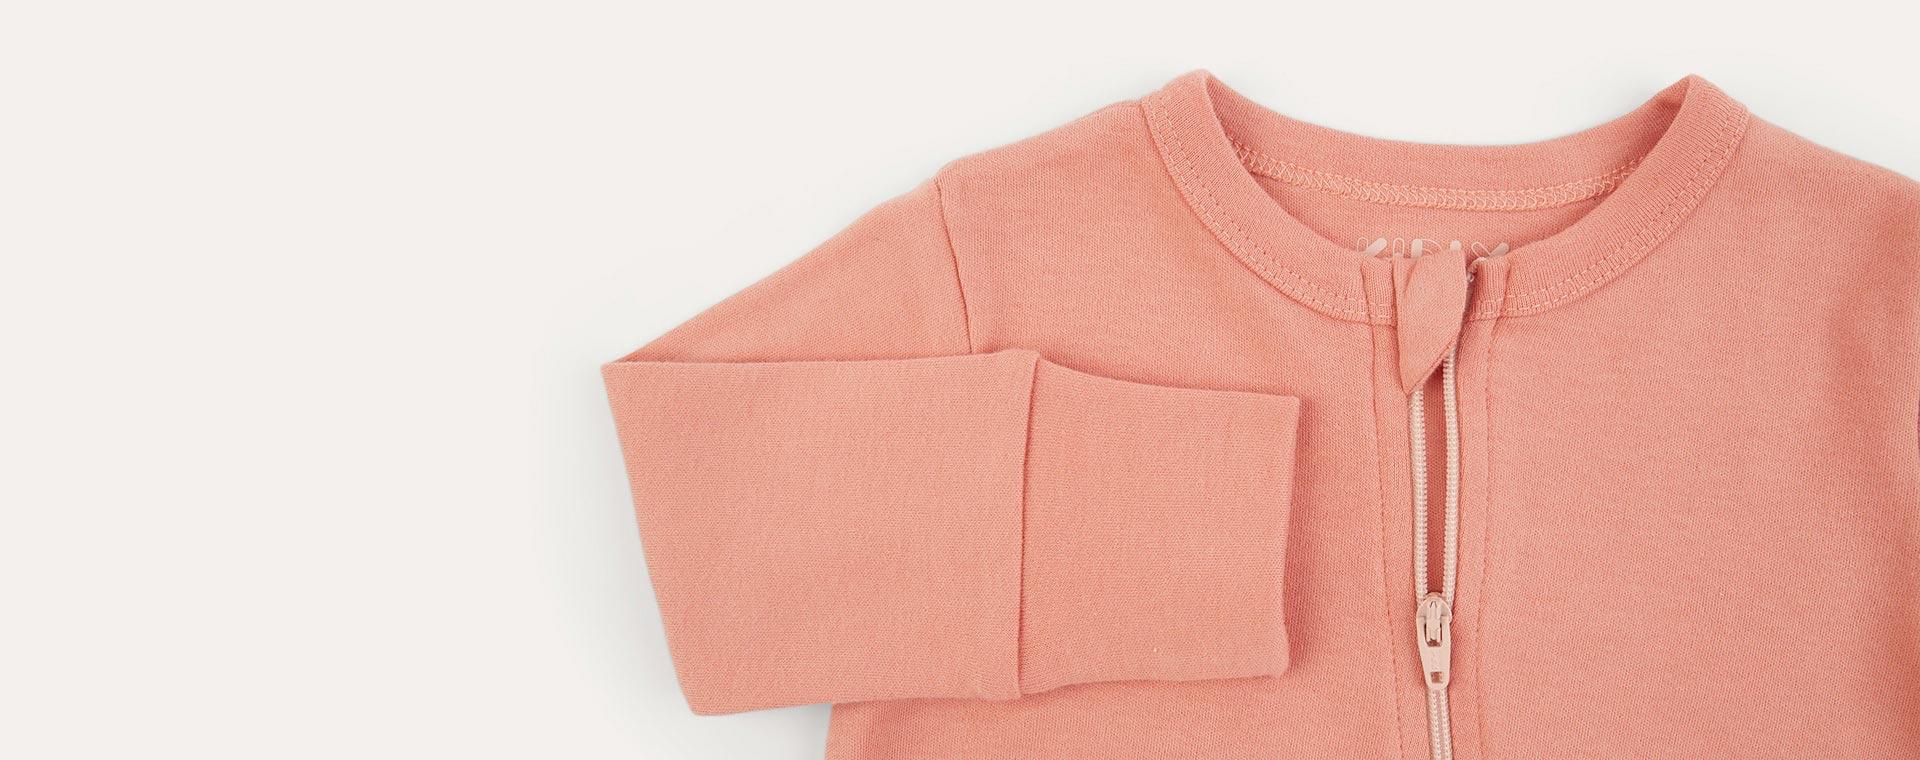 Blush Mix KIDLY Label Organic Zip Sleepsuit